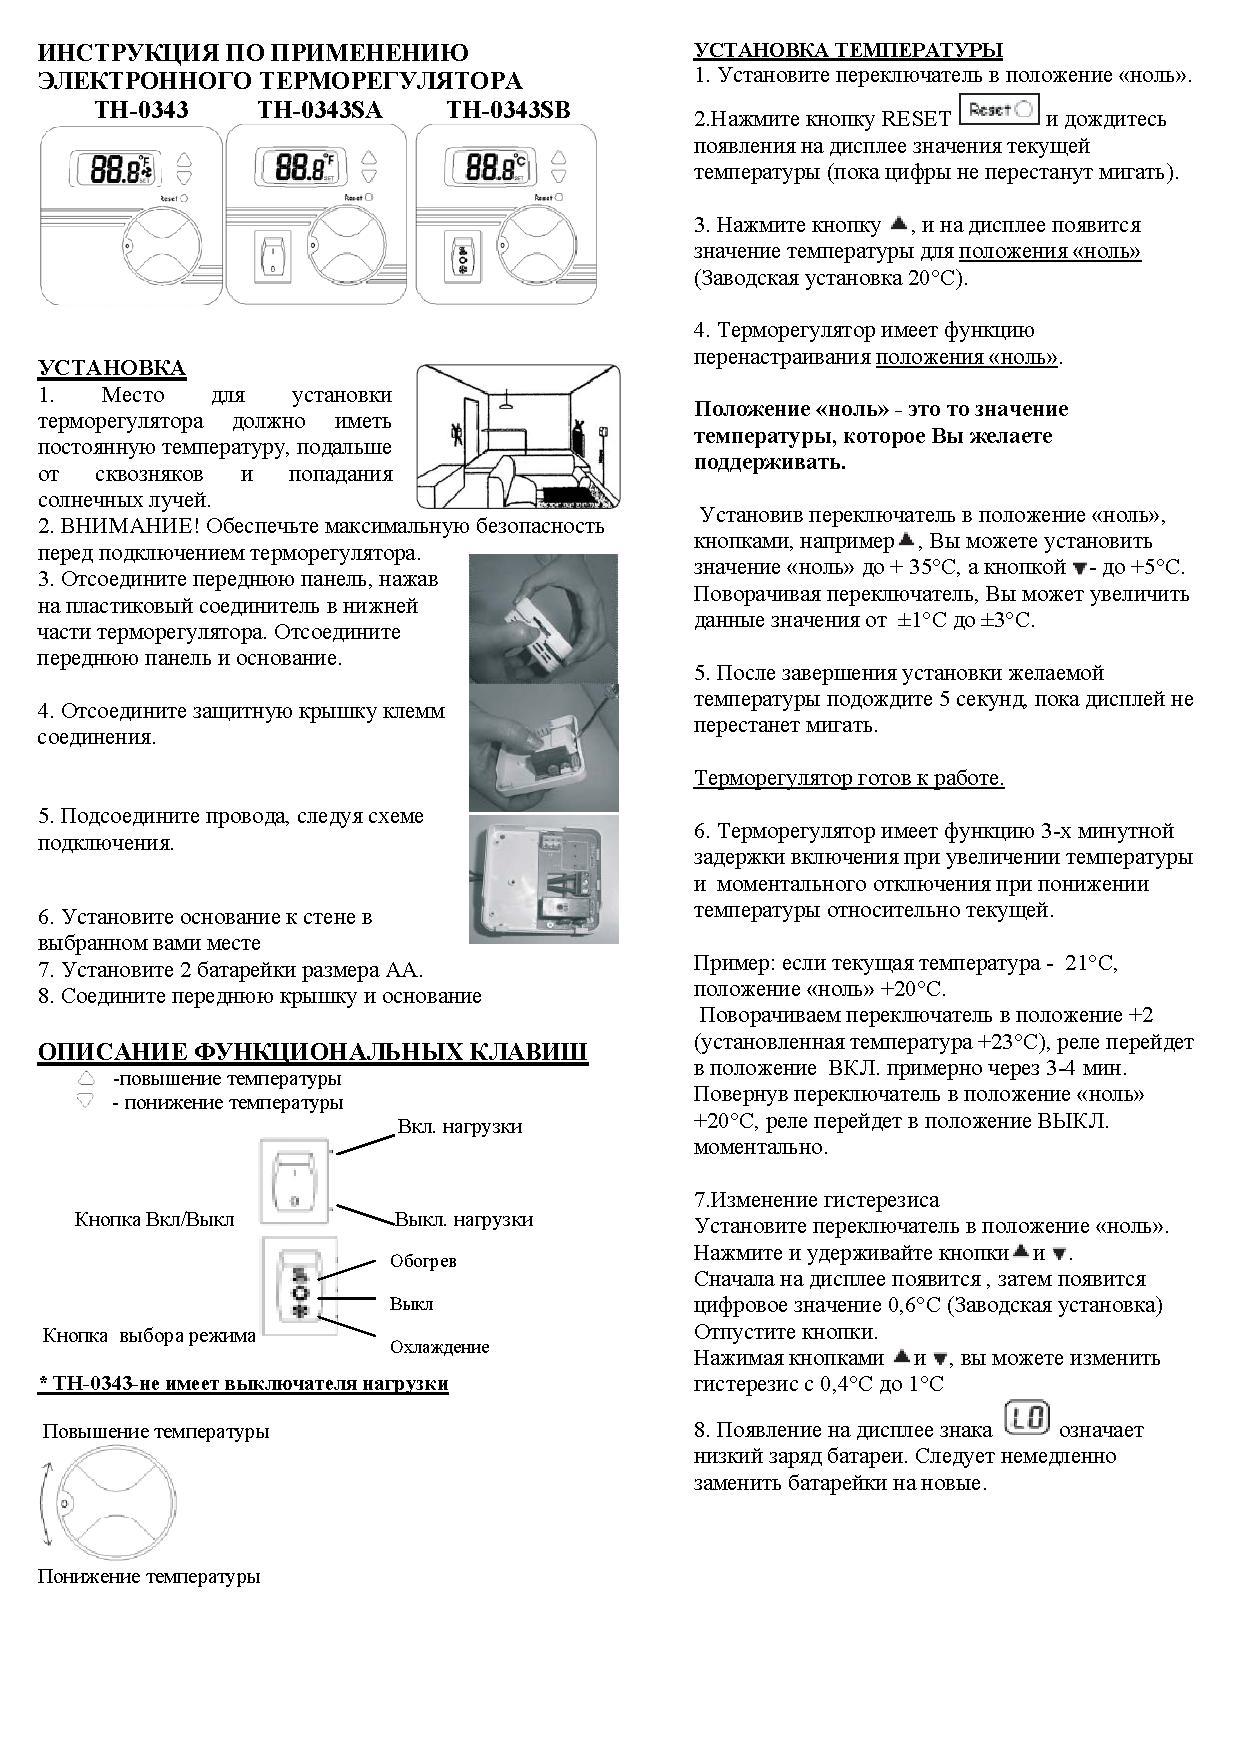 Инструкция на терморегулятор Frontier TH-0343SA